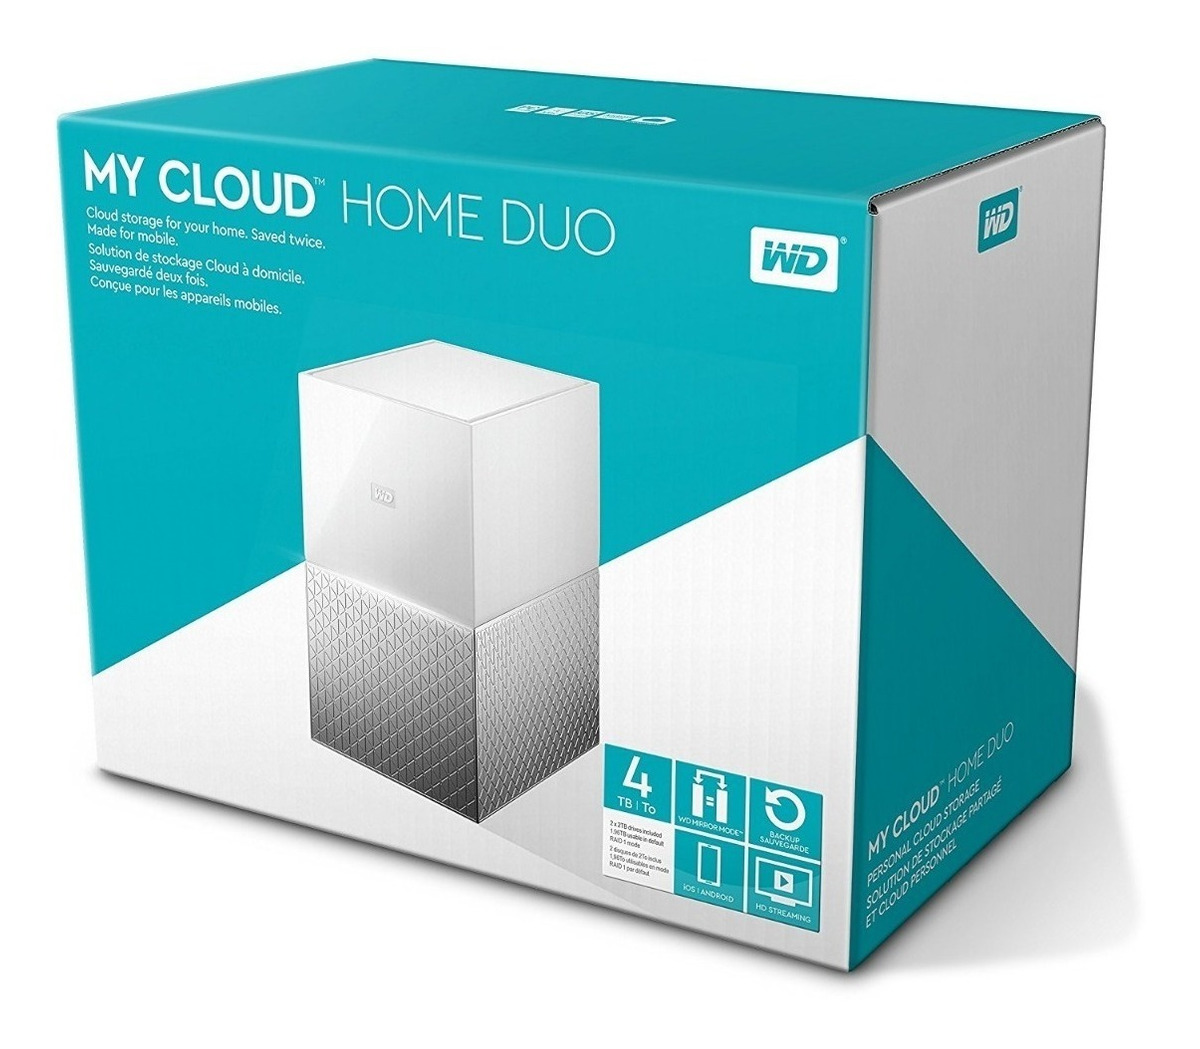 Hd Externo Western Digital 4tb My Cloud Home Duo Nuvem 4 Tb